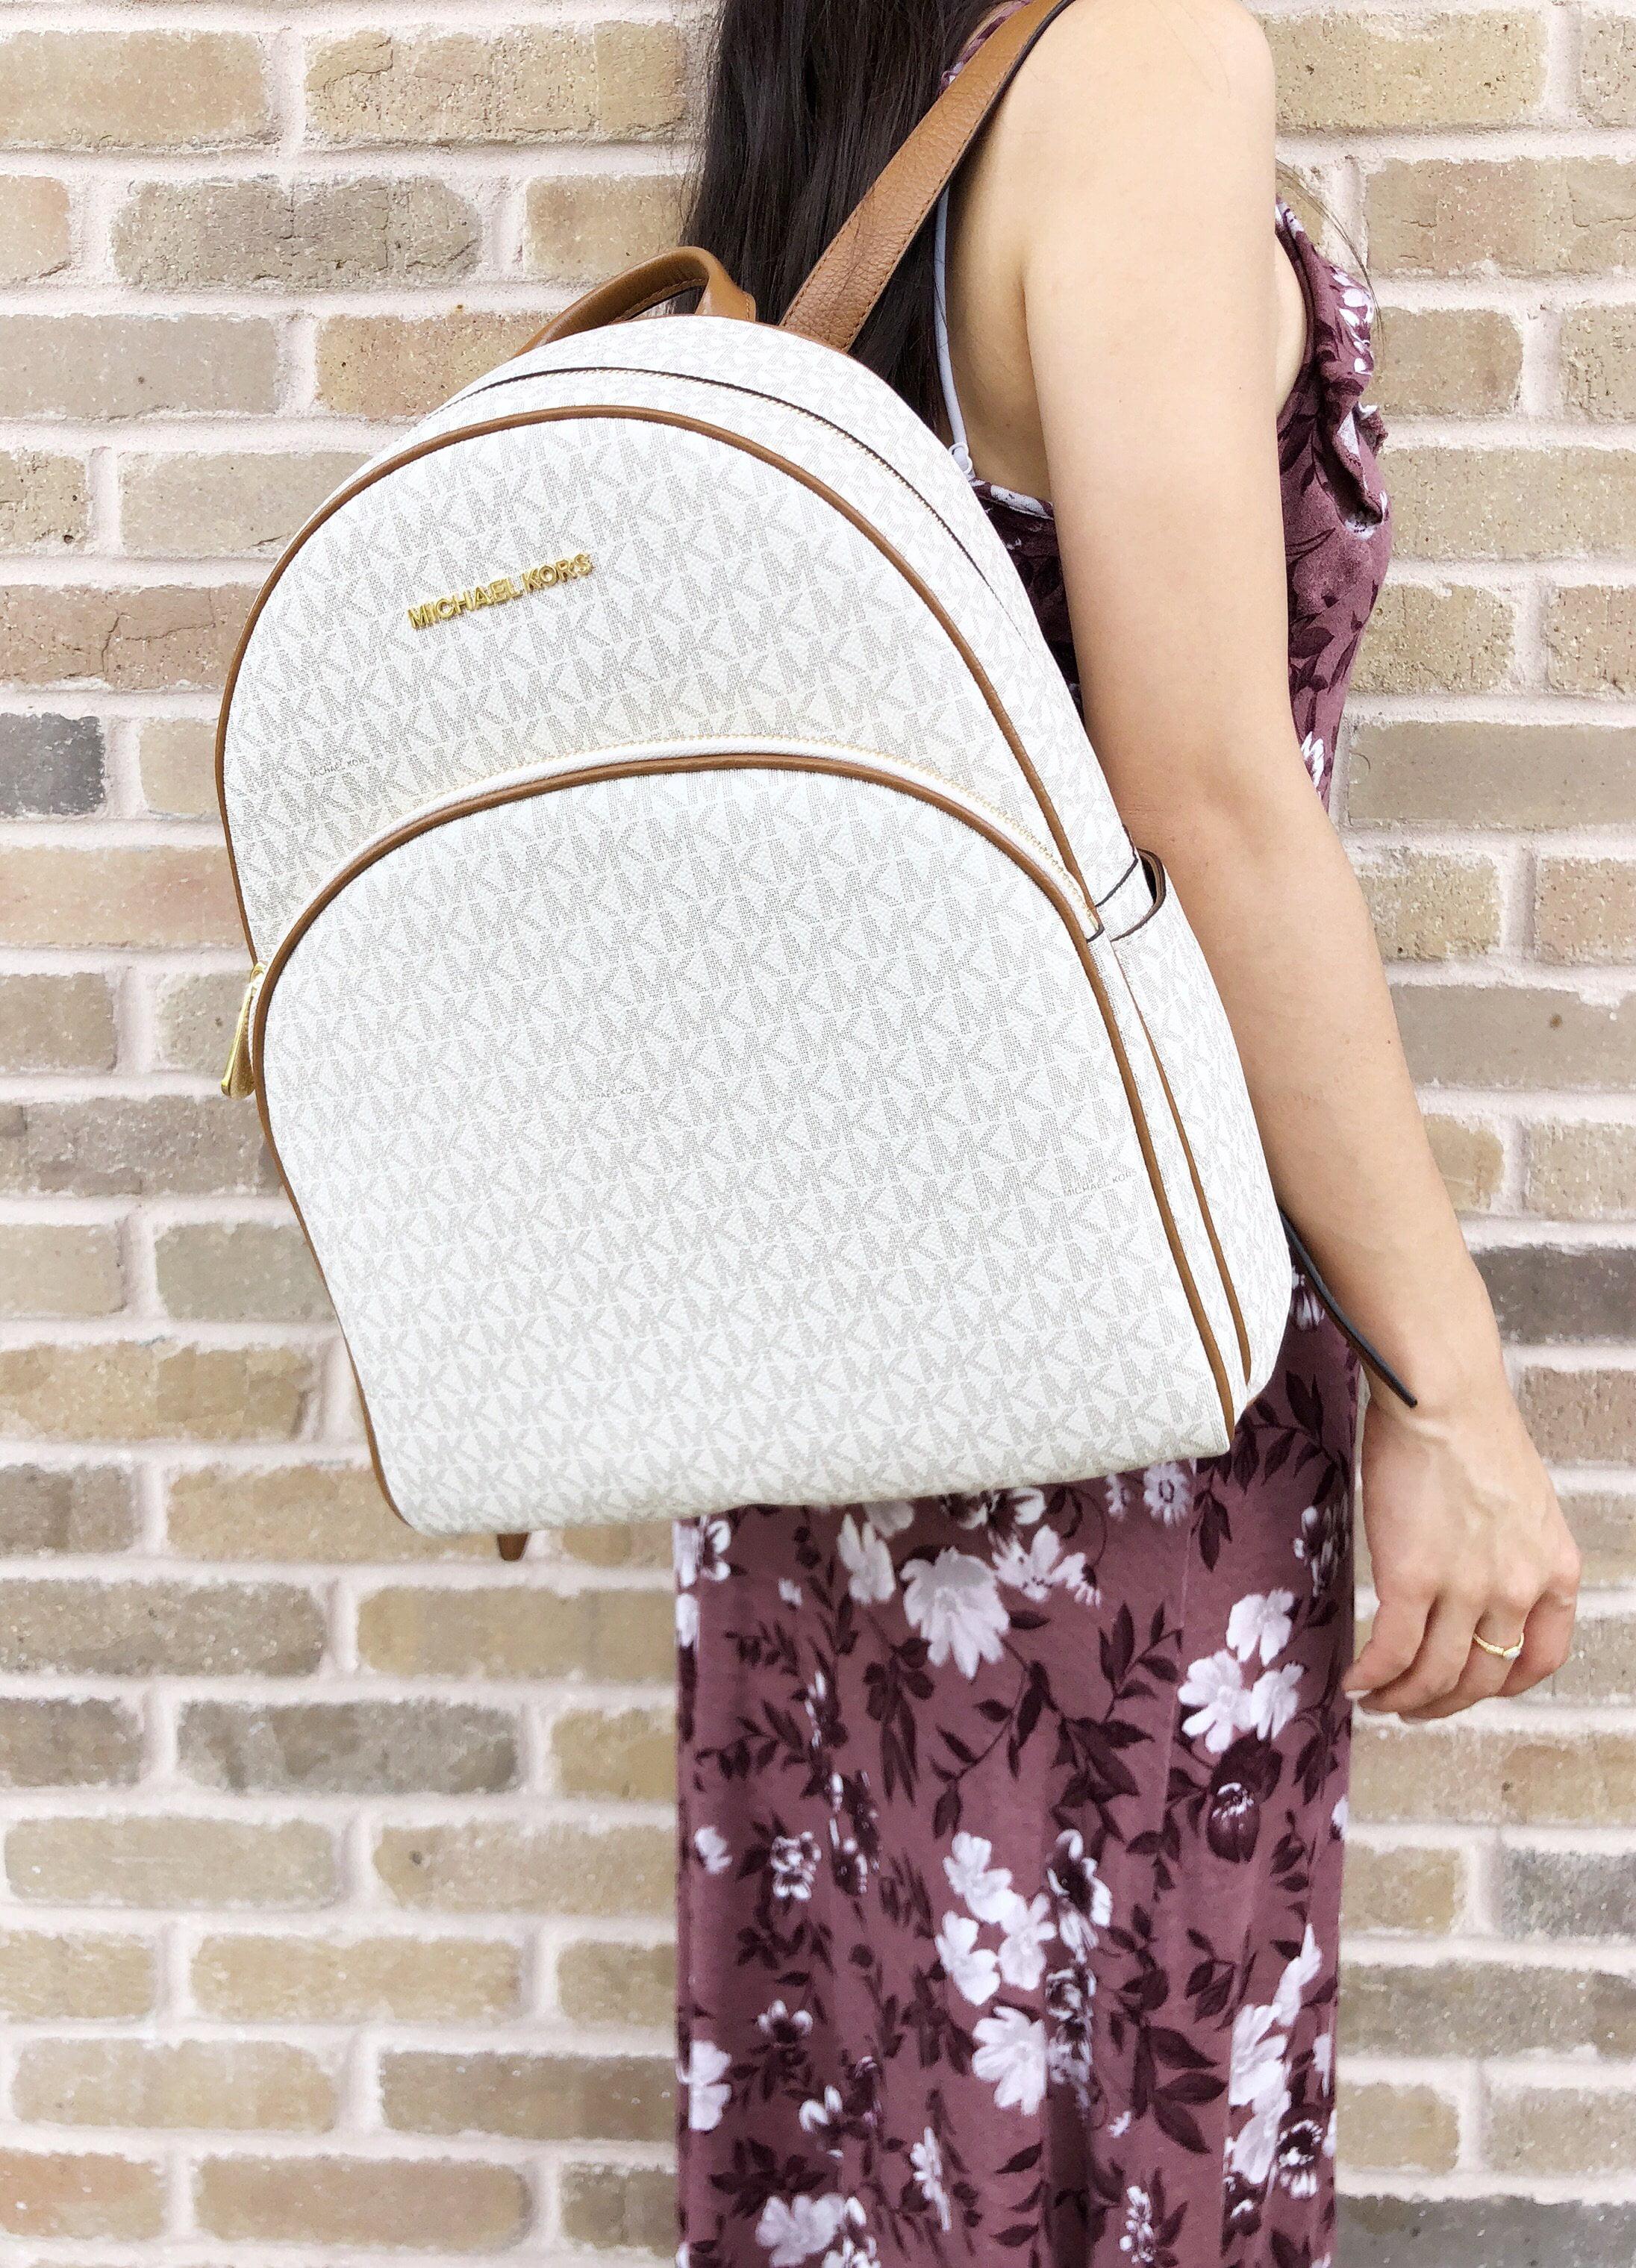 1dda38a7049a ... new style michael kors abbey large backpack vanilla mk signature pvc  leather 2018 fall b2125 f4566